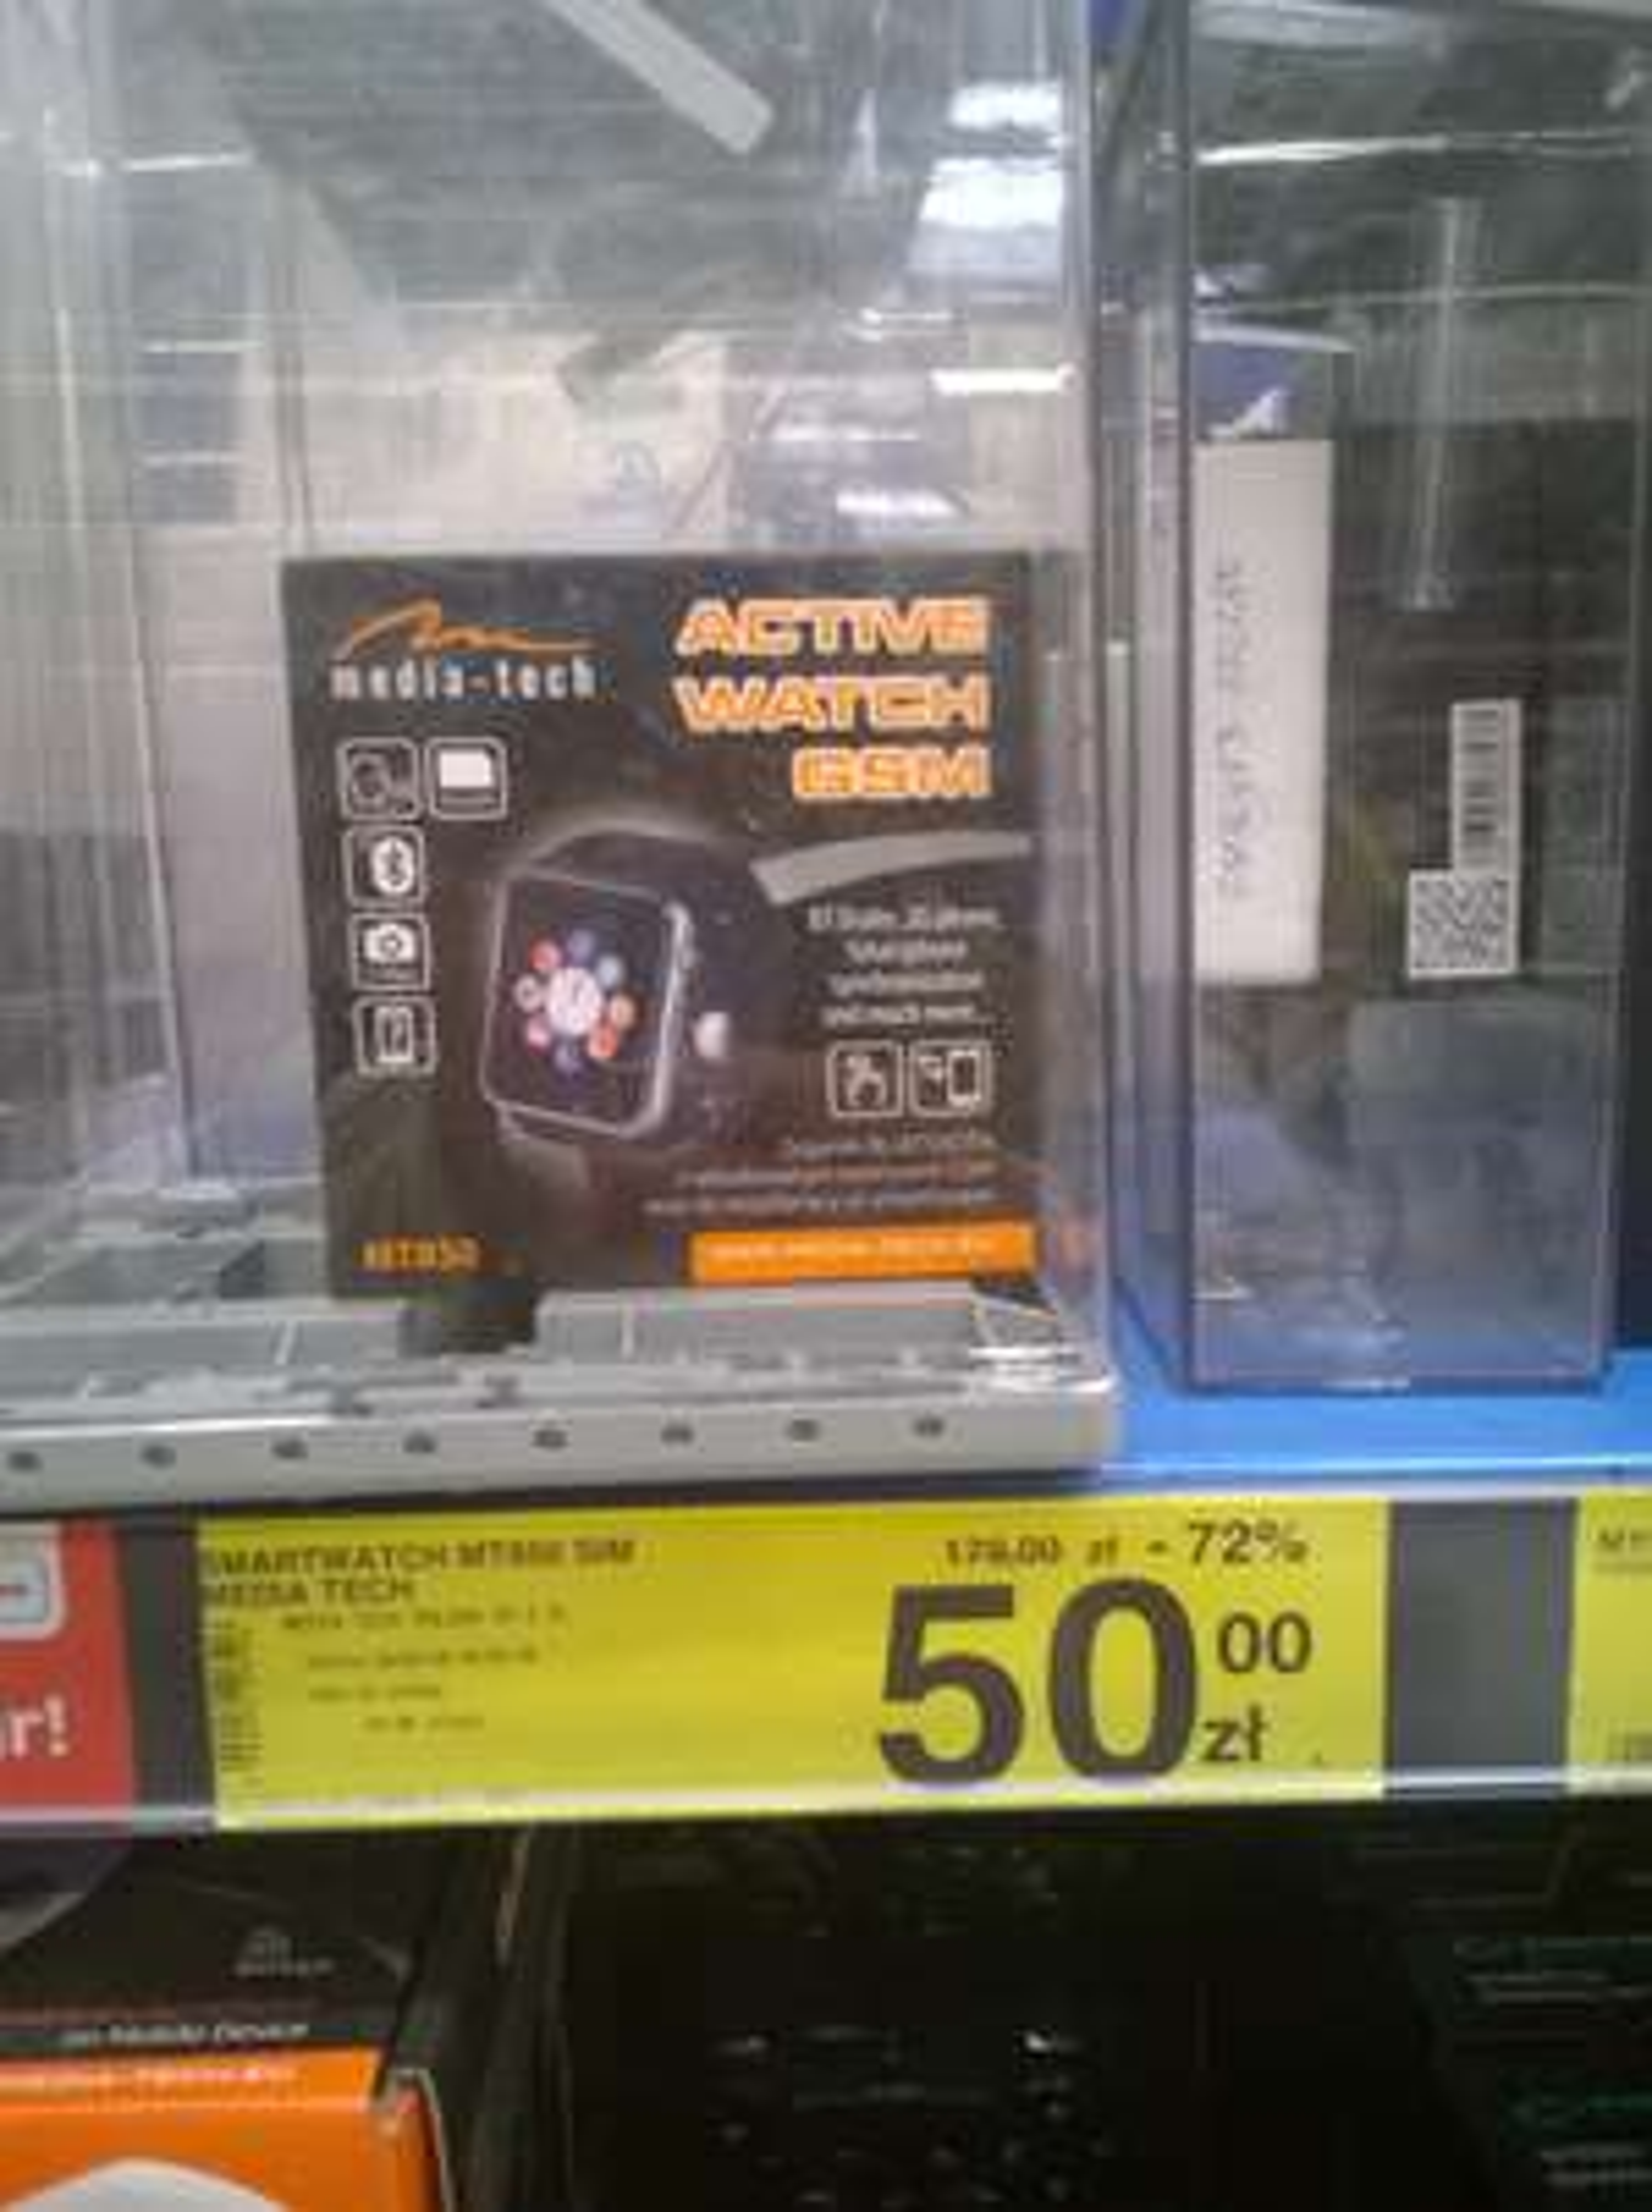 Smartwatch MEDIA-TECH MT850 - Carrefour